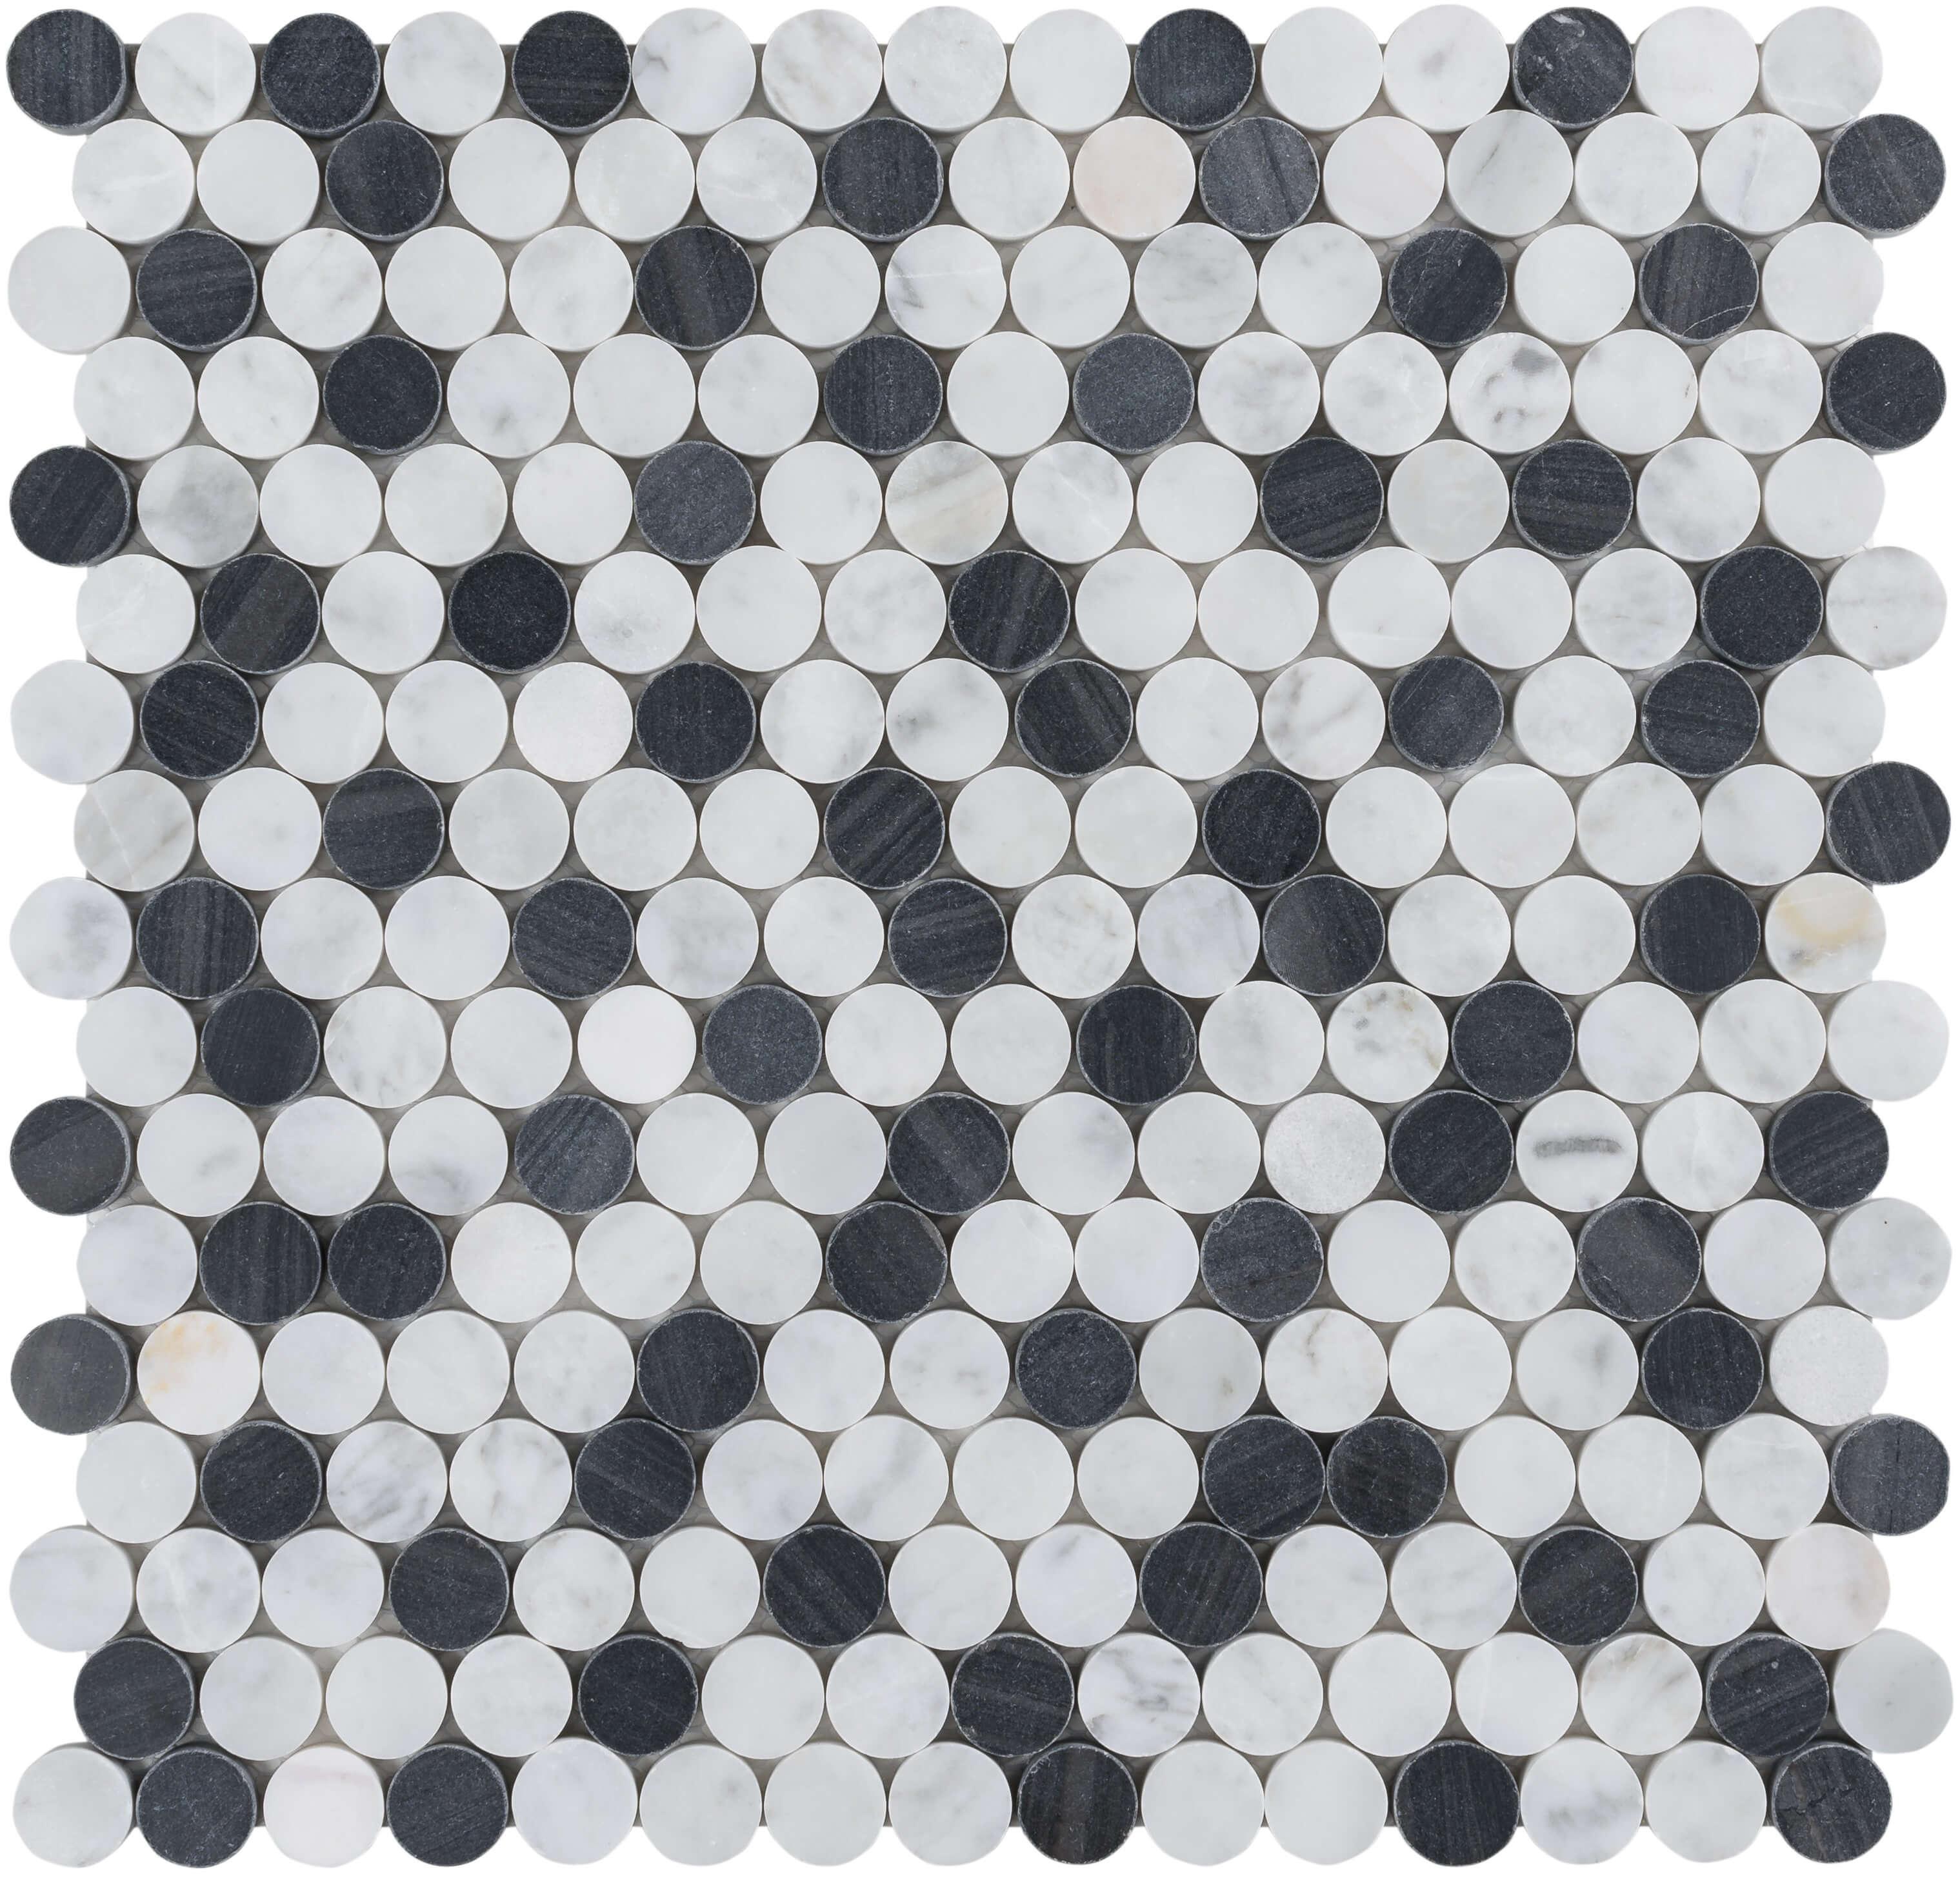 Black n White Button Field